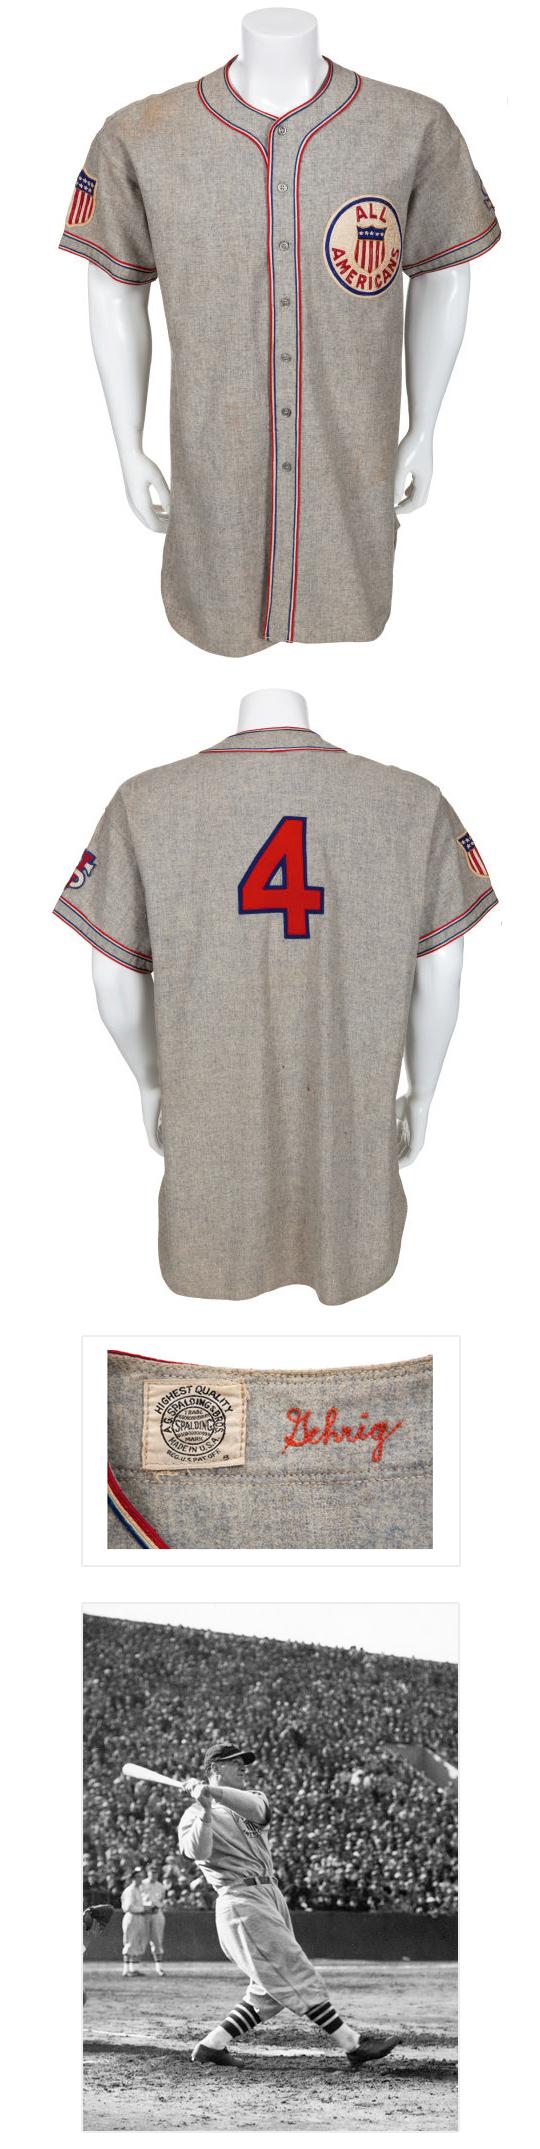 1934 Lou Gehrig Tour of Japan Game Worn Uniform.